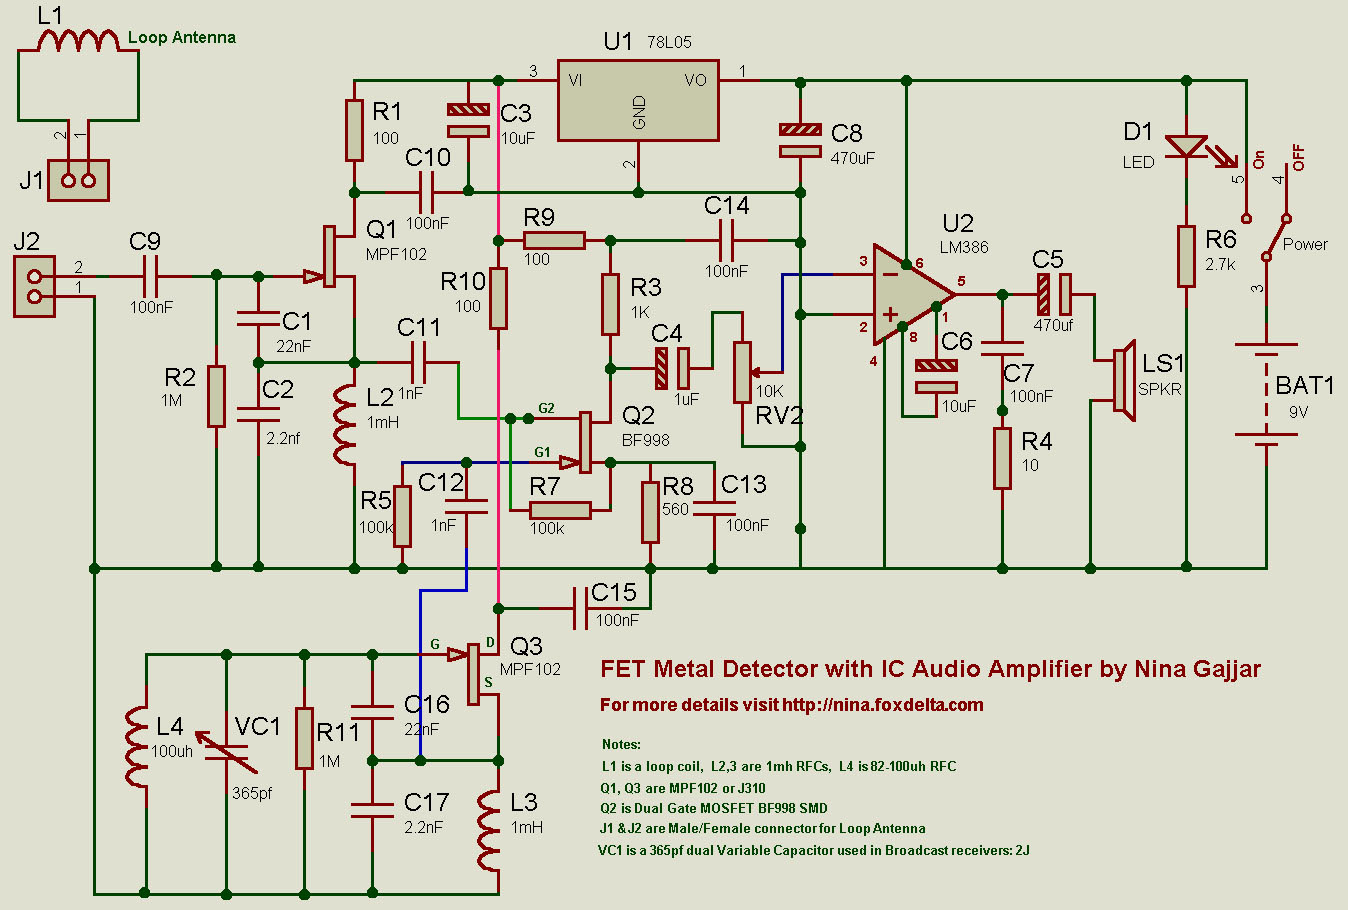 Fet metal detector by nina gajjar metal detector document schematic document schematic schematic jpg ccuart Choice Image